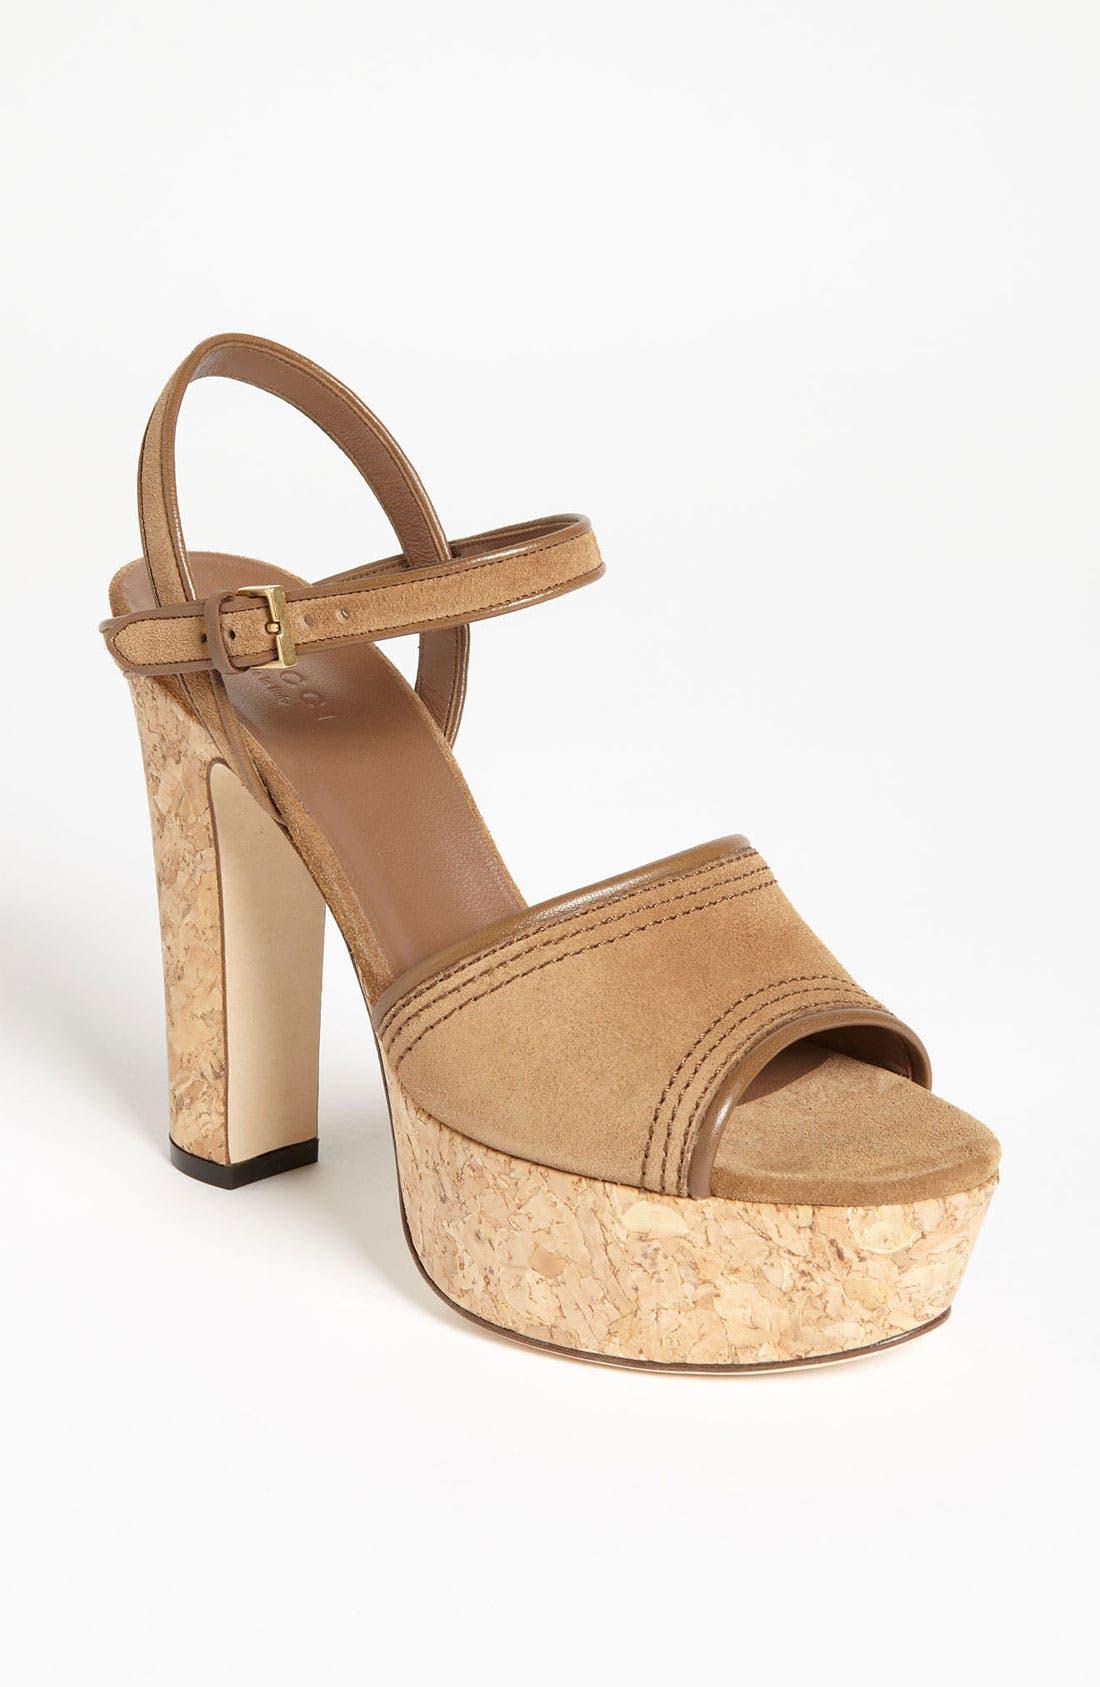 Alternate Image 1 Selected - Gucci 'Danielle' Platform Sandal